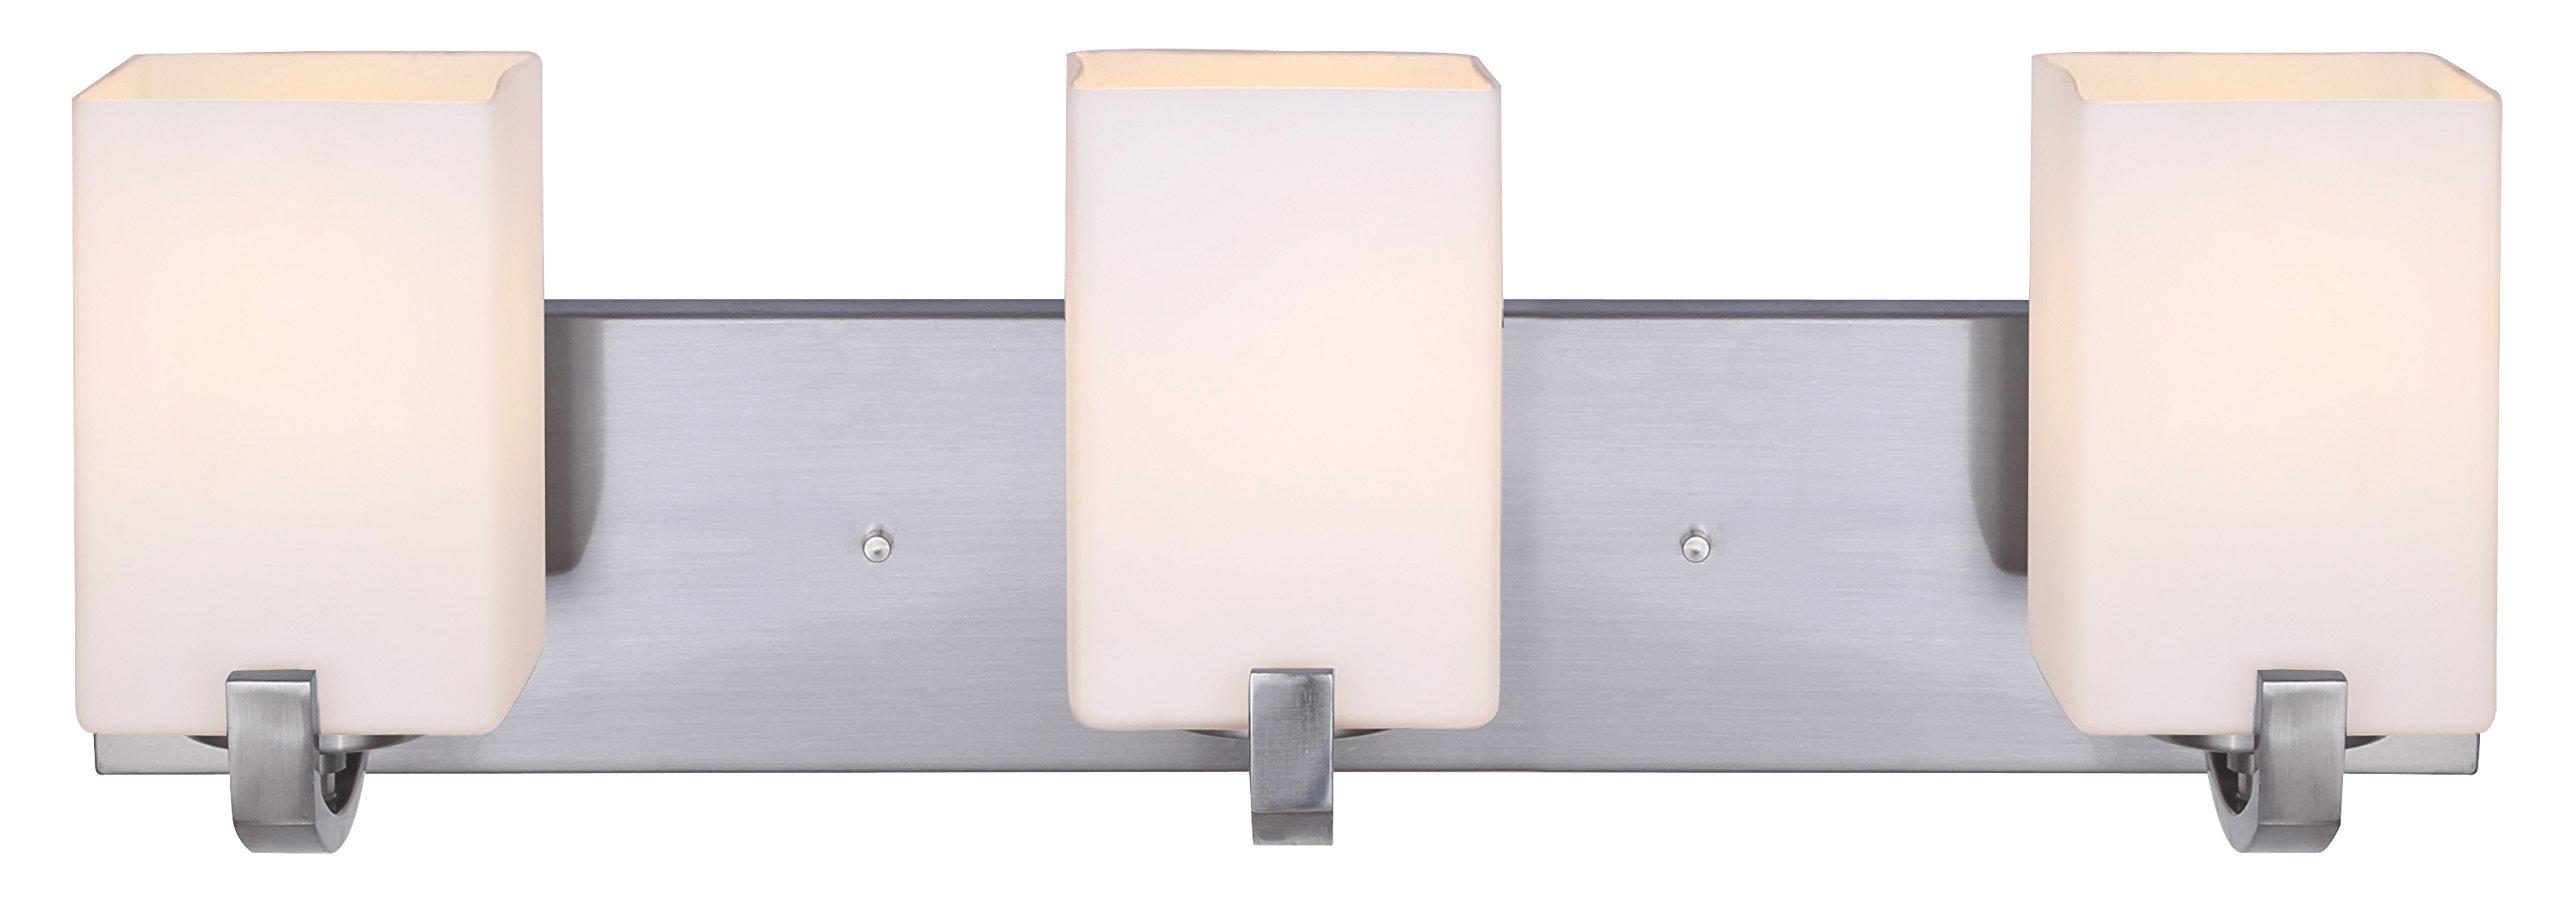 Canarm IVL422A03BN Palmer 3-Light Bath Vanity, Brushed Nickel